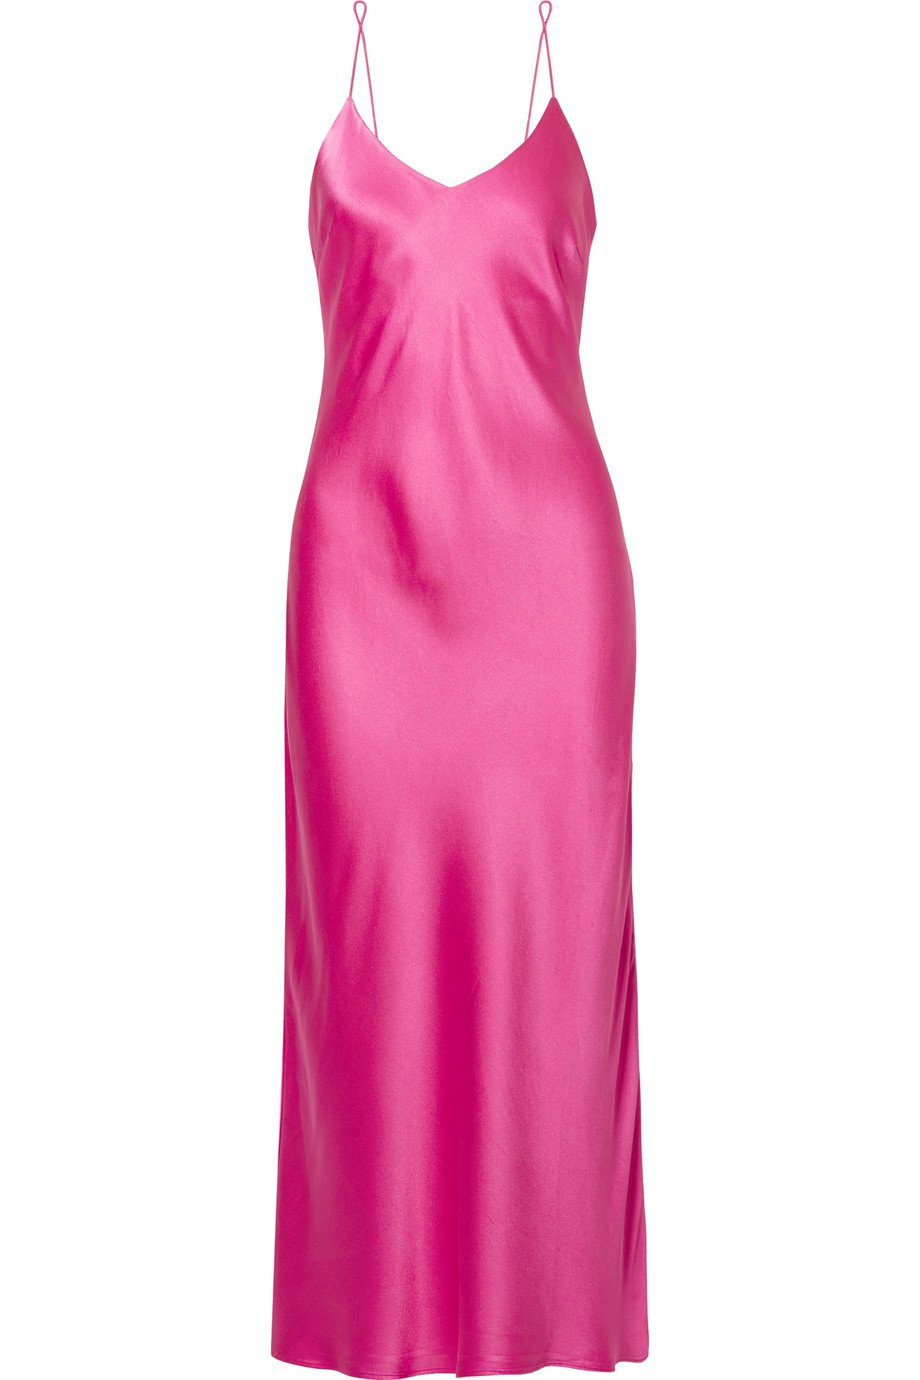 Anine Bing | Rosemary silk-satin midi dress | NET-A-PORTER.COM